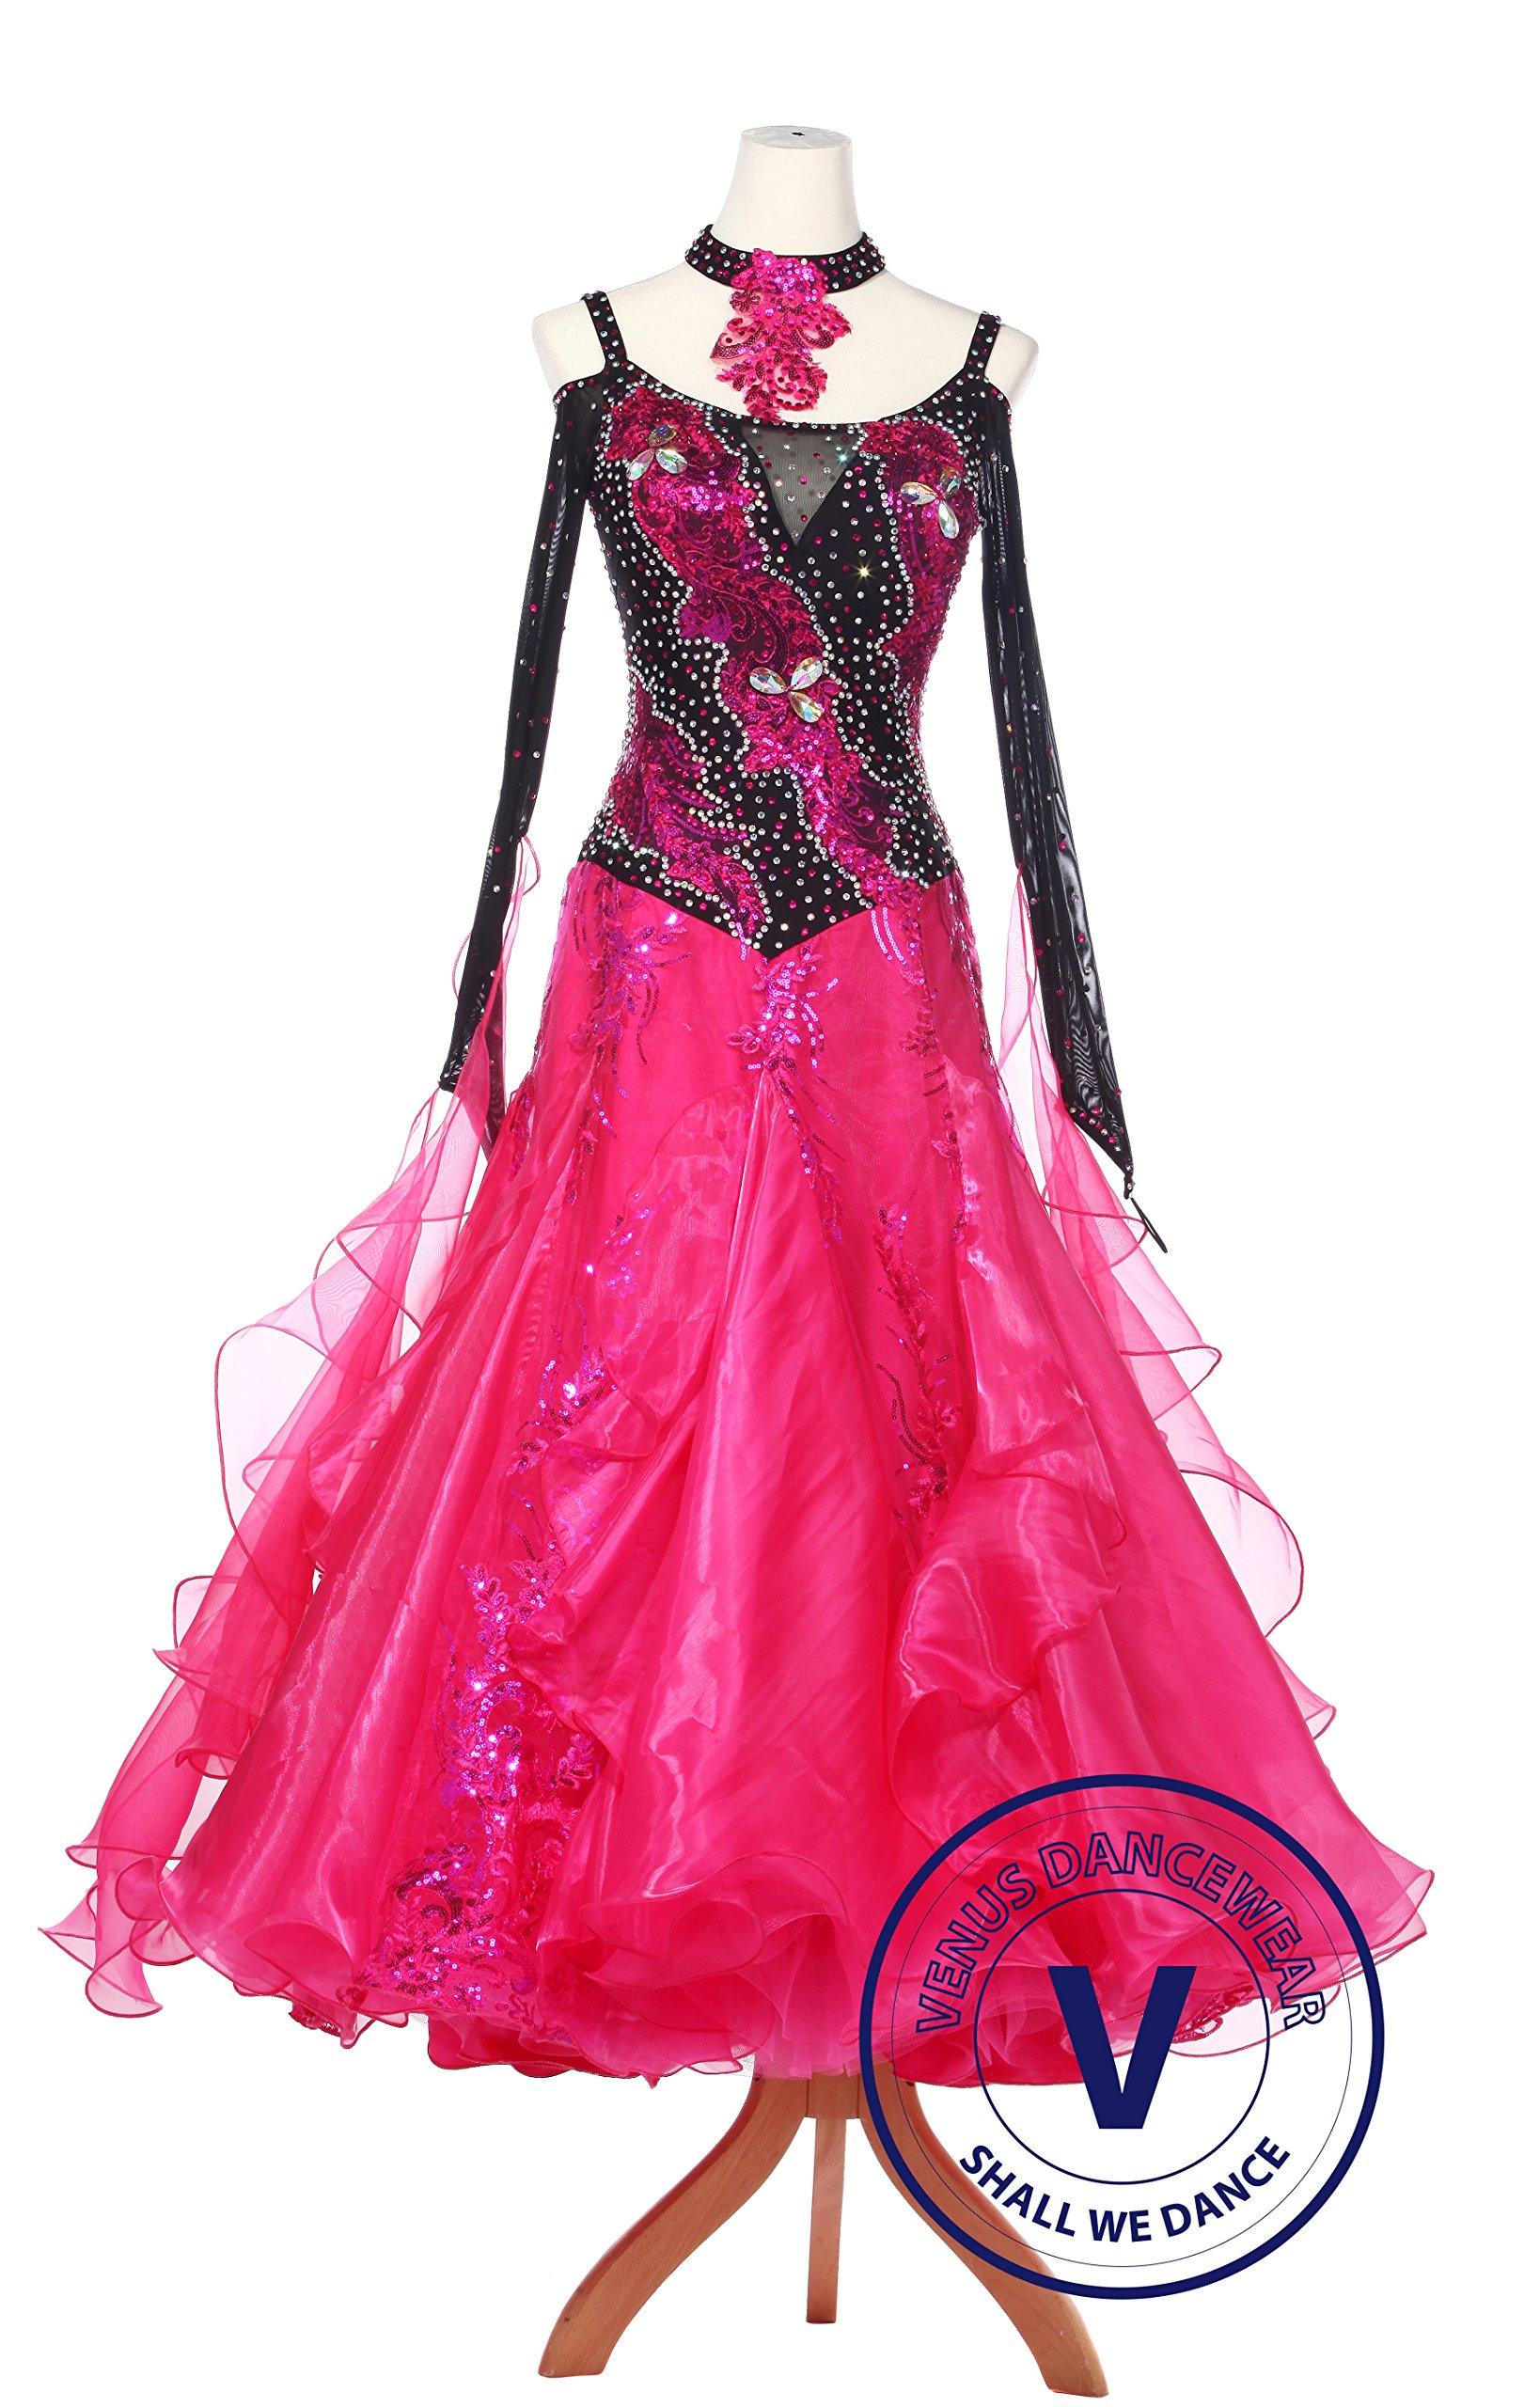 Venus Dancewear Black and Red Standard Ballroom Waltz Foxtrot Smooth Competition Dance Dress